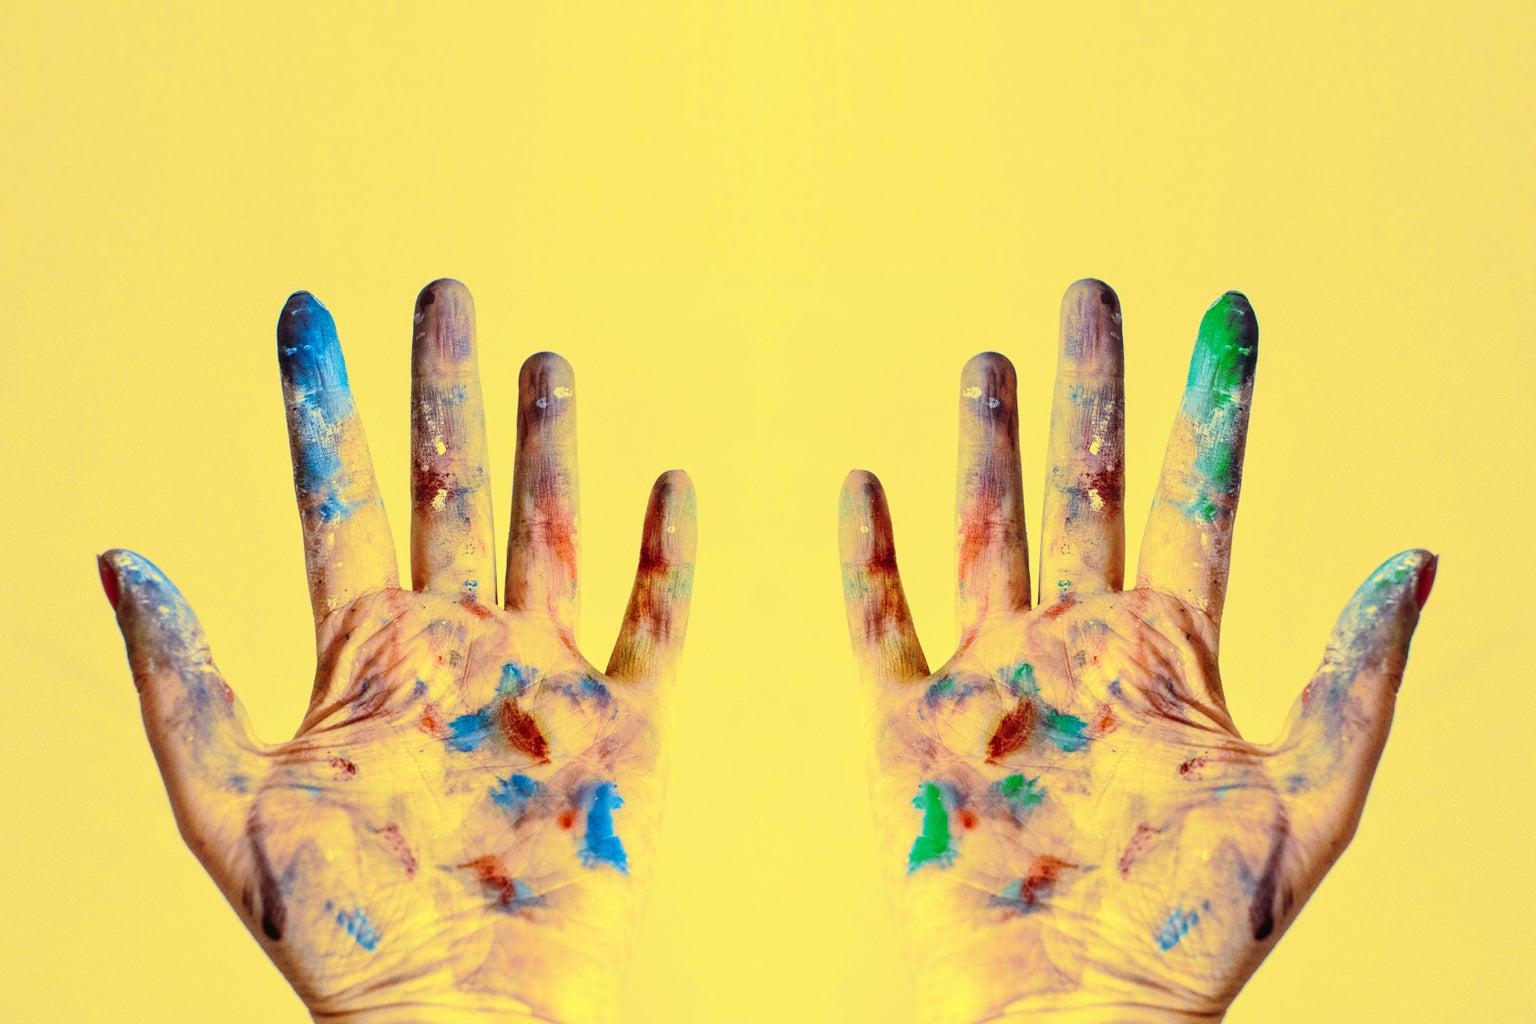 paint-splattered gloves against yellow background